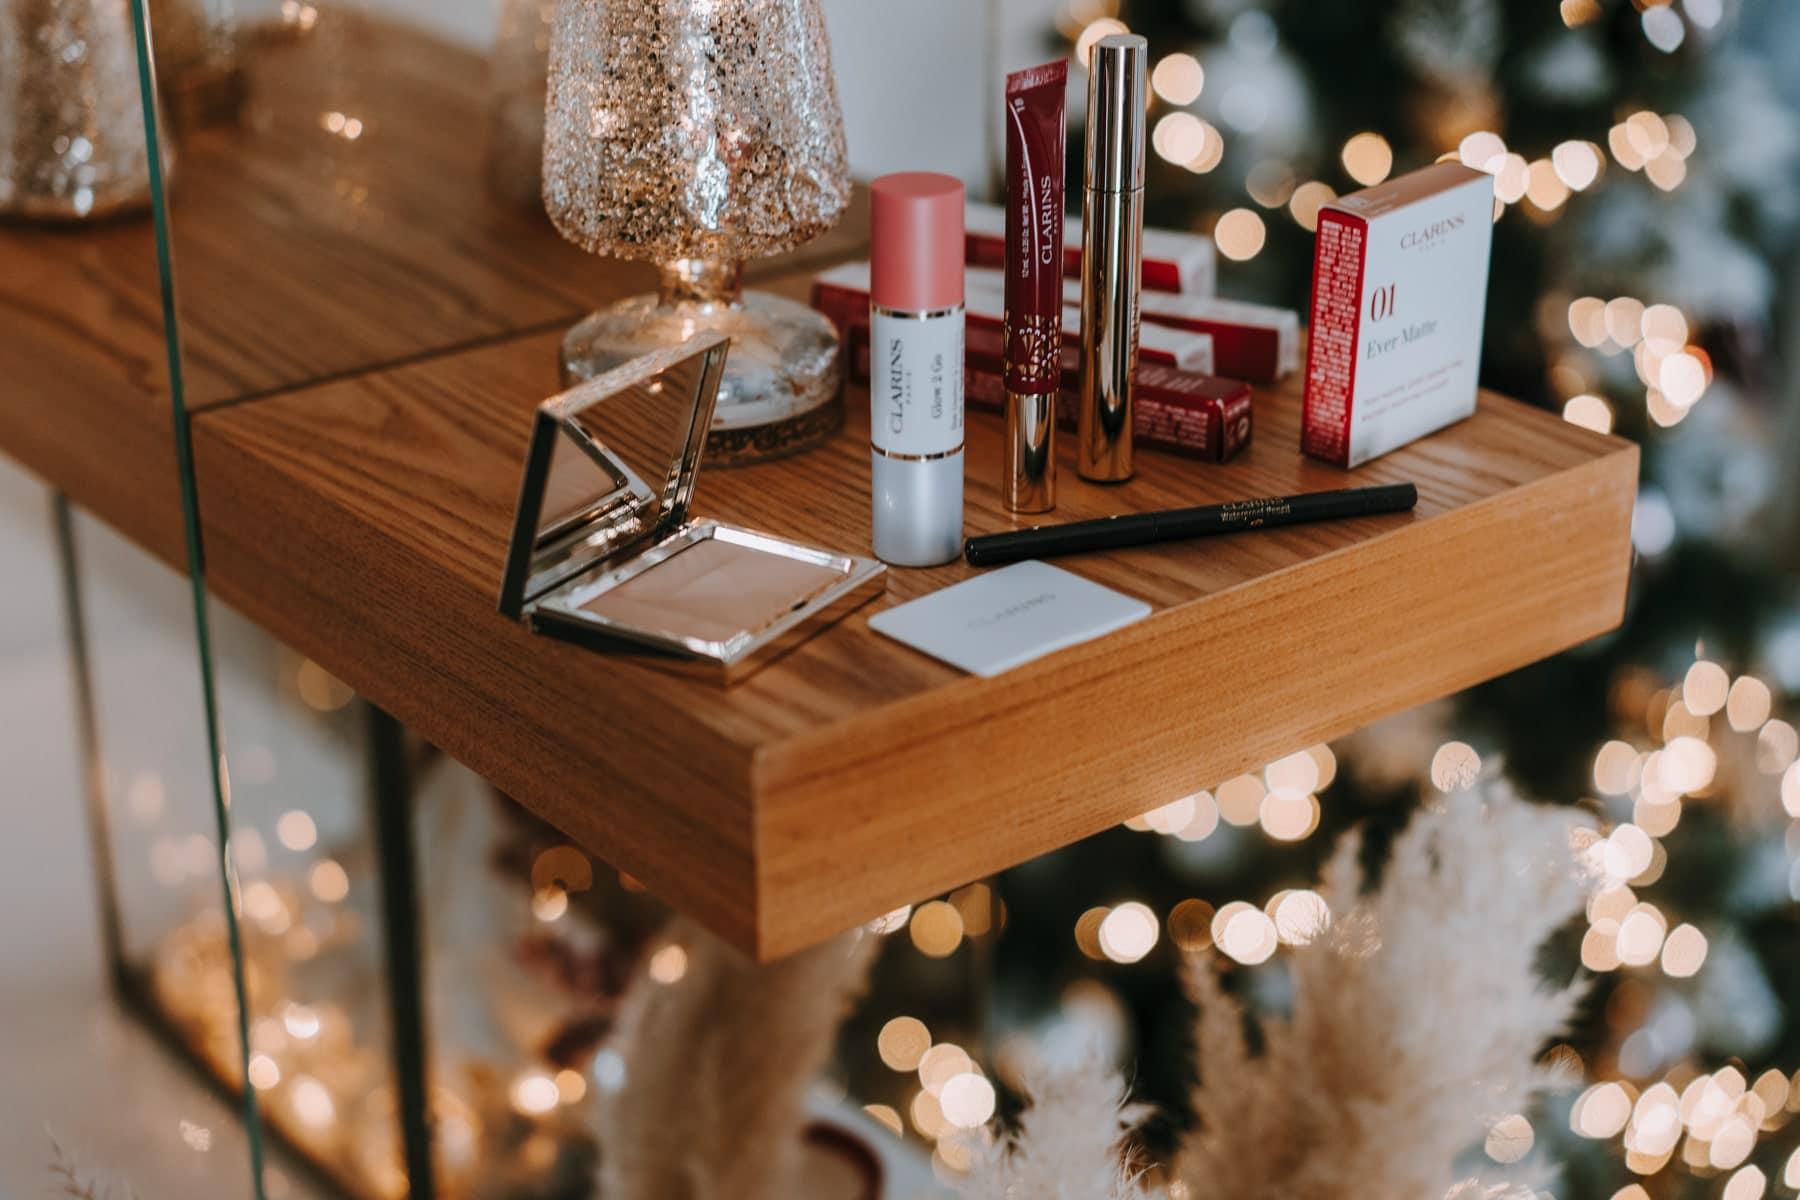 Adventskalender Türchen 1 - Clarins Beauty Set